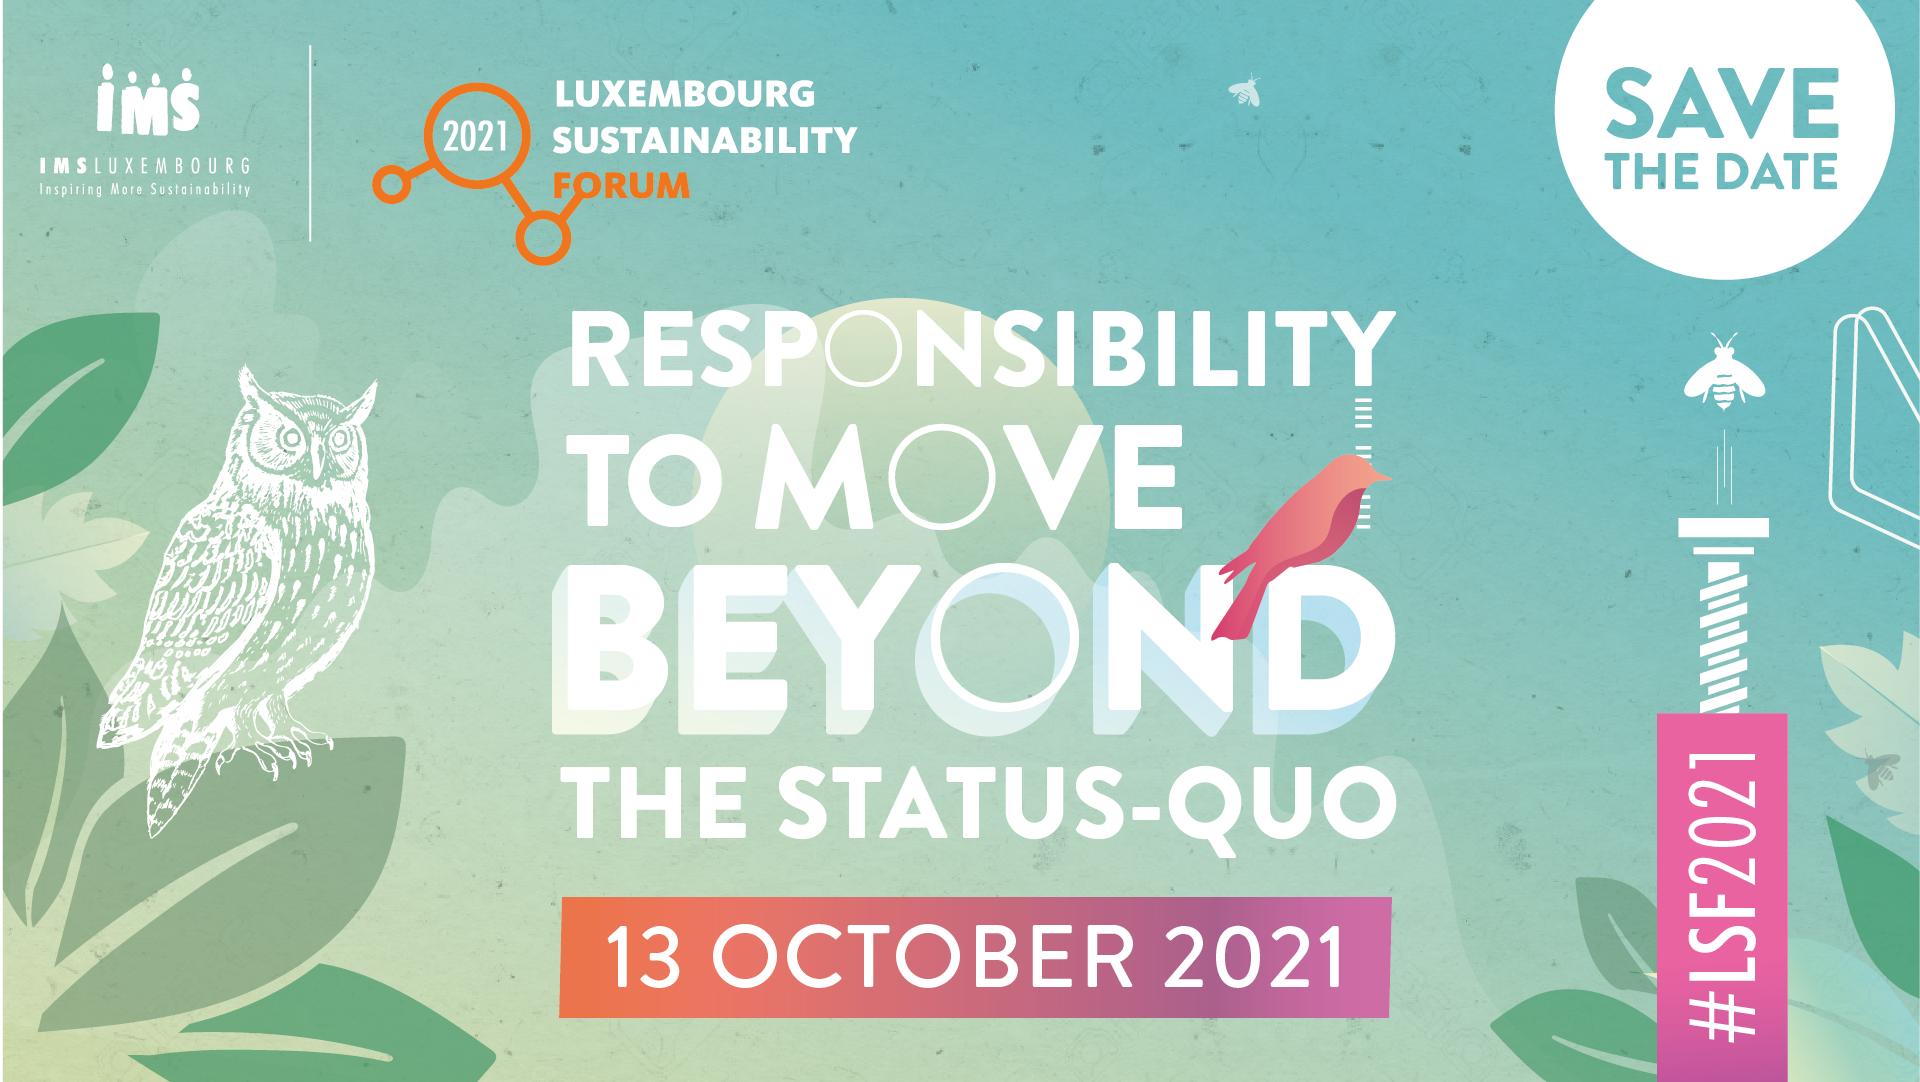 Save the date : le Luxembourg Sustainability Forum 2021 aura lieu le 13 octobre